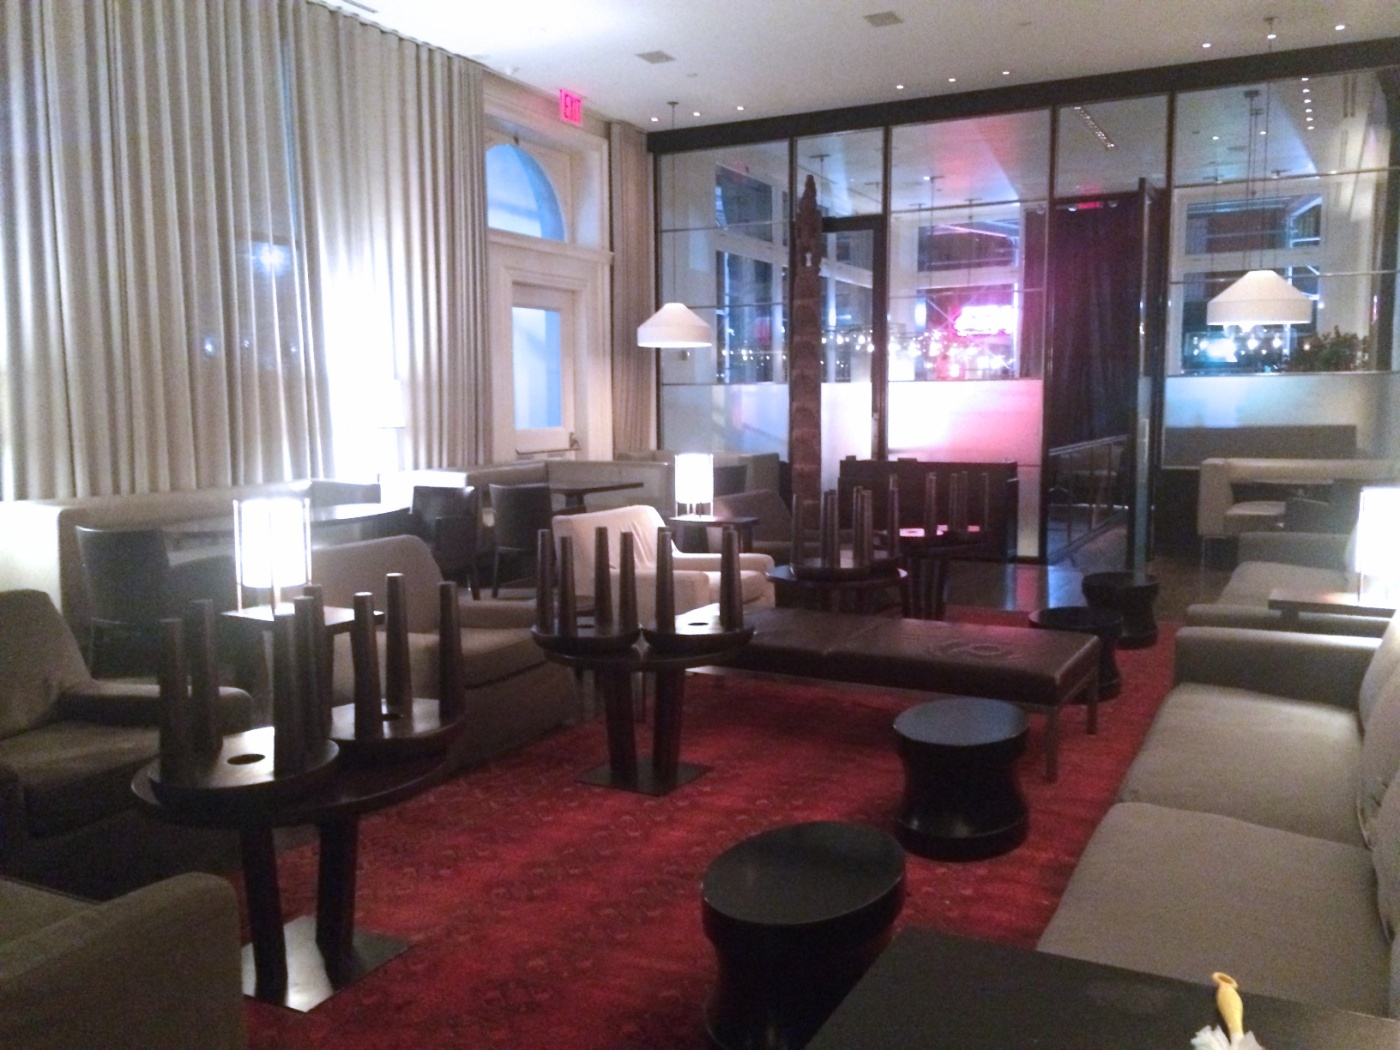 Lobby at The Mercer